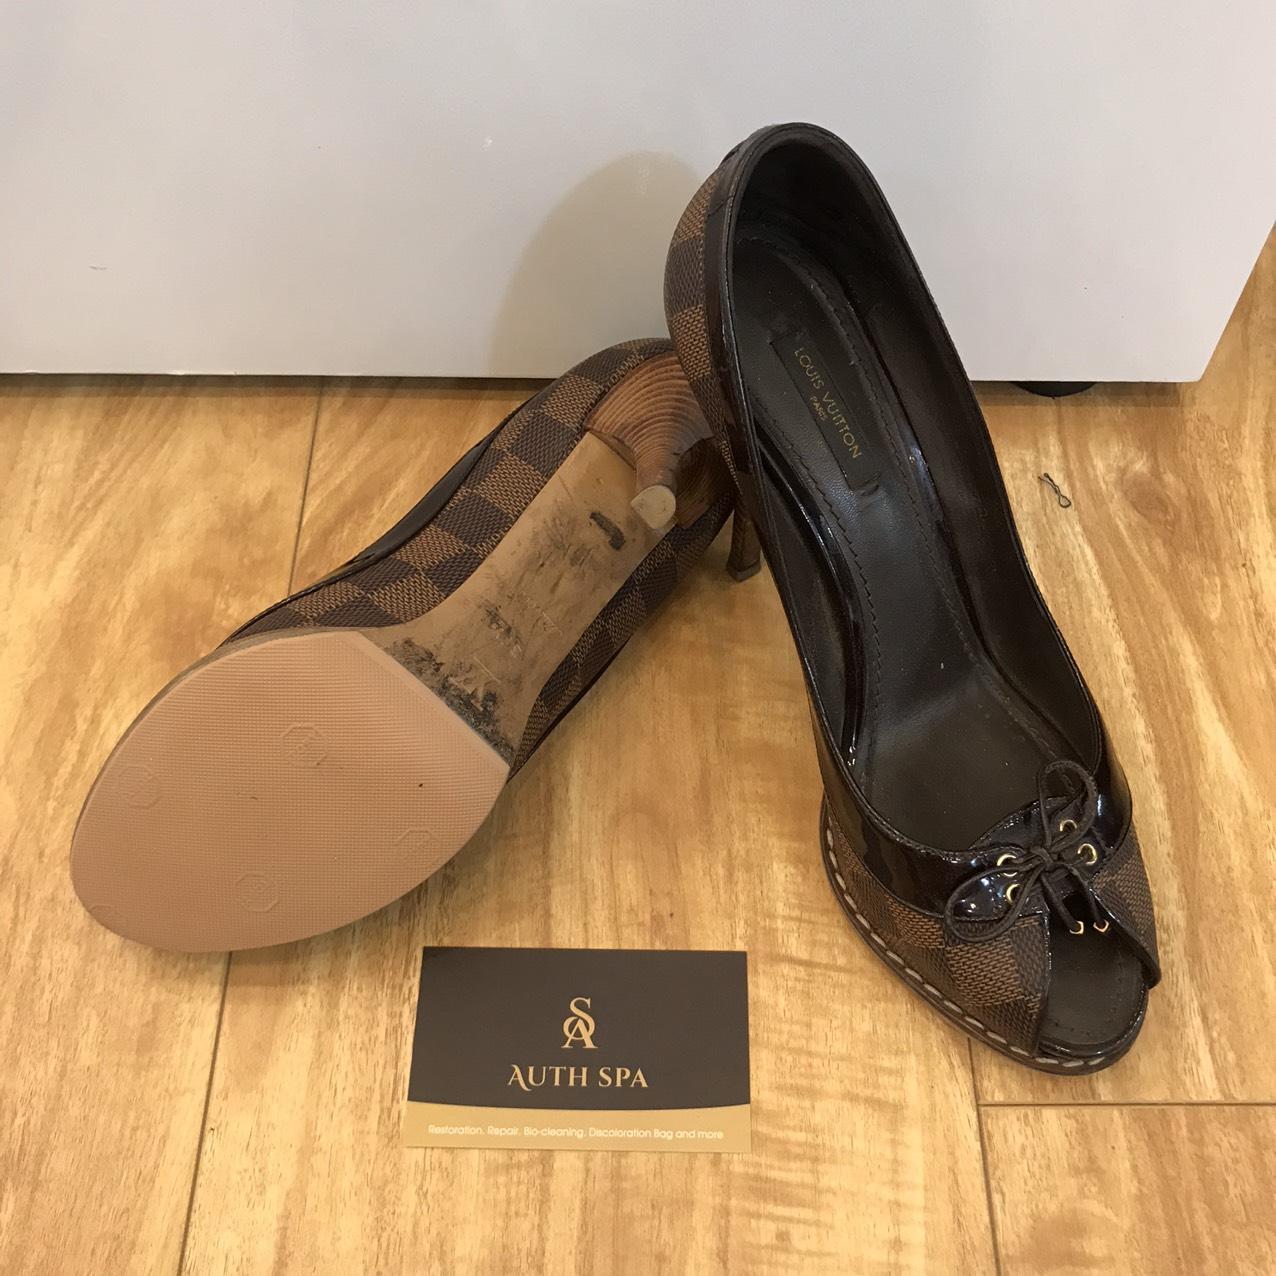 Sửa Chữa Giày Dép Gucci, Chanel, Louis Vuitton, Hermes ... 14